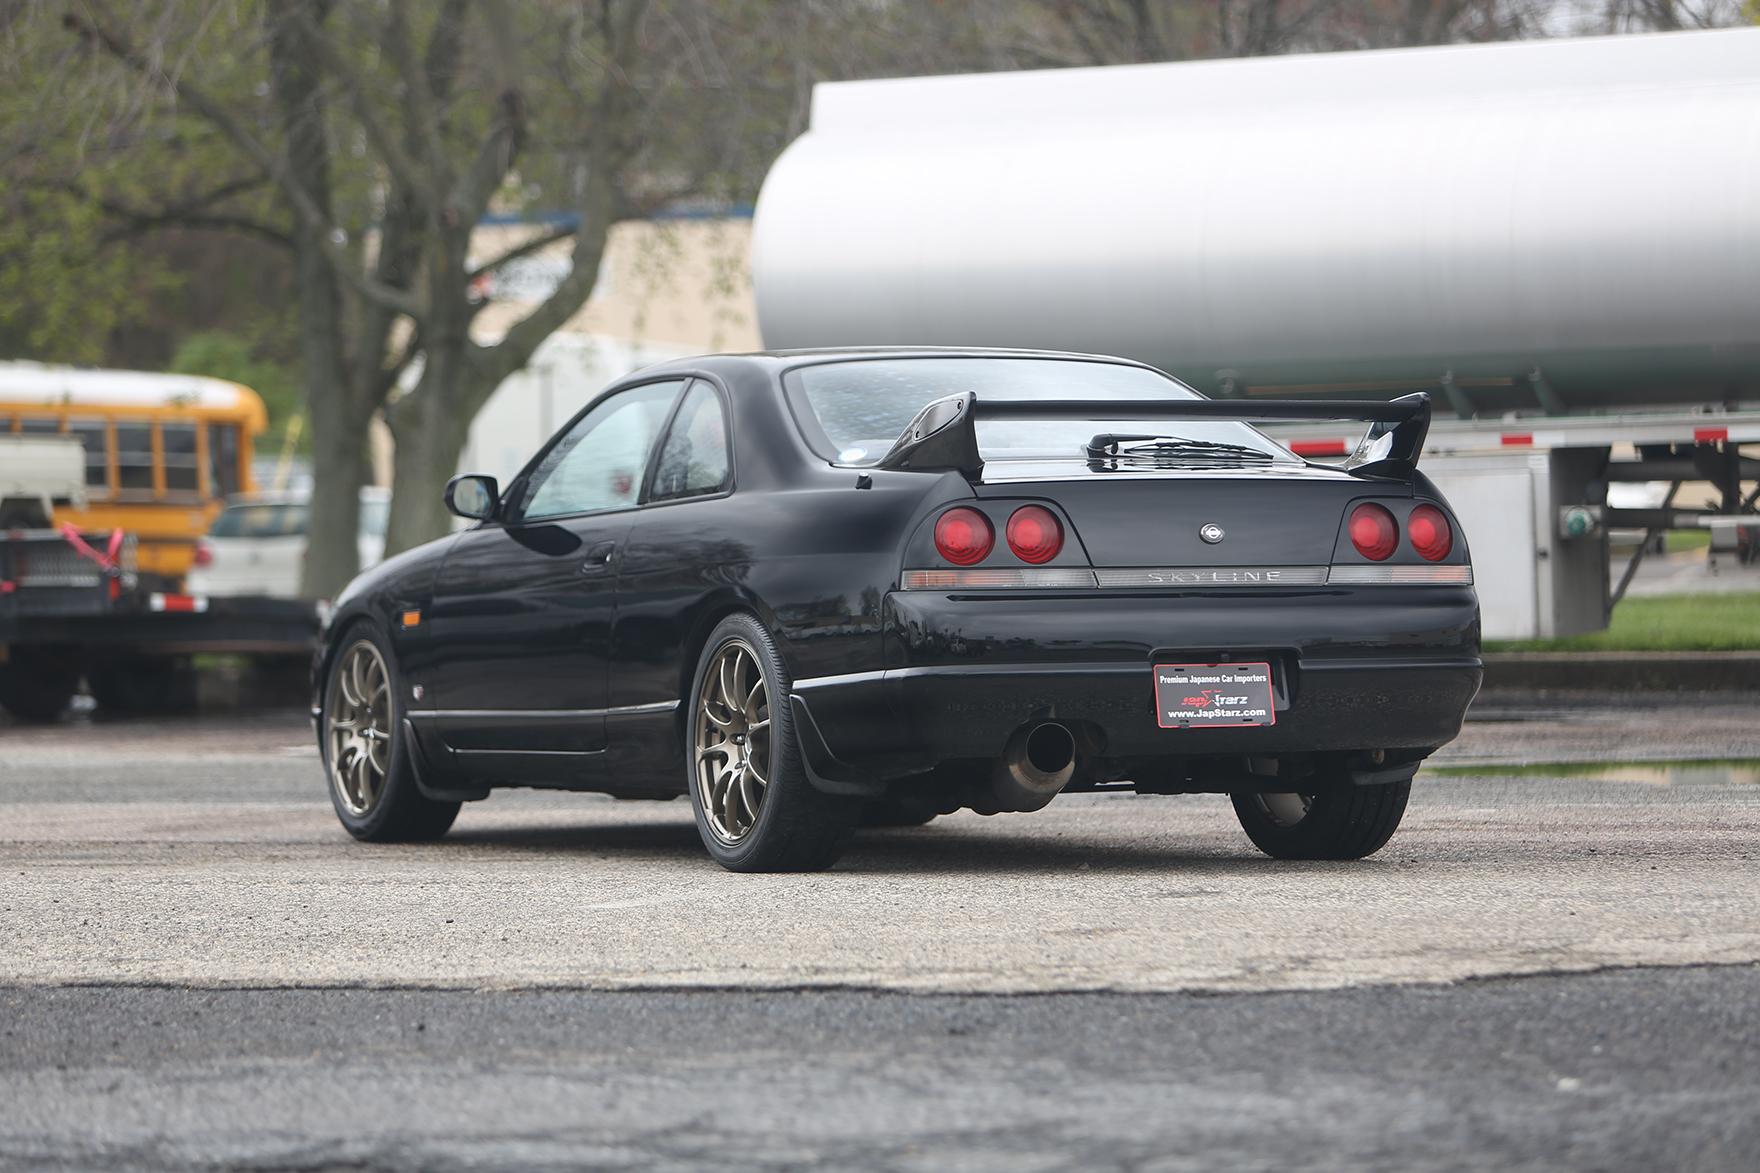 Nissan Skyline R33 GTST - SOLD